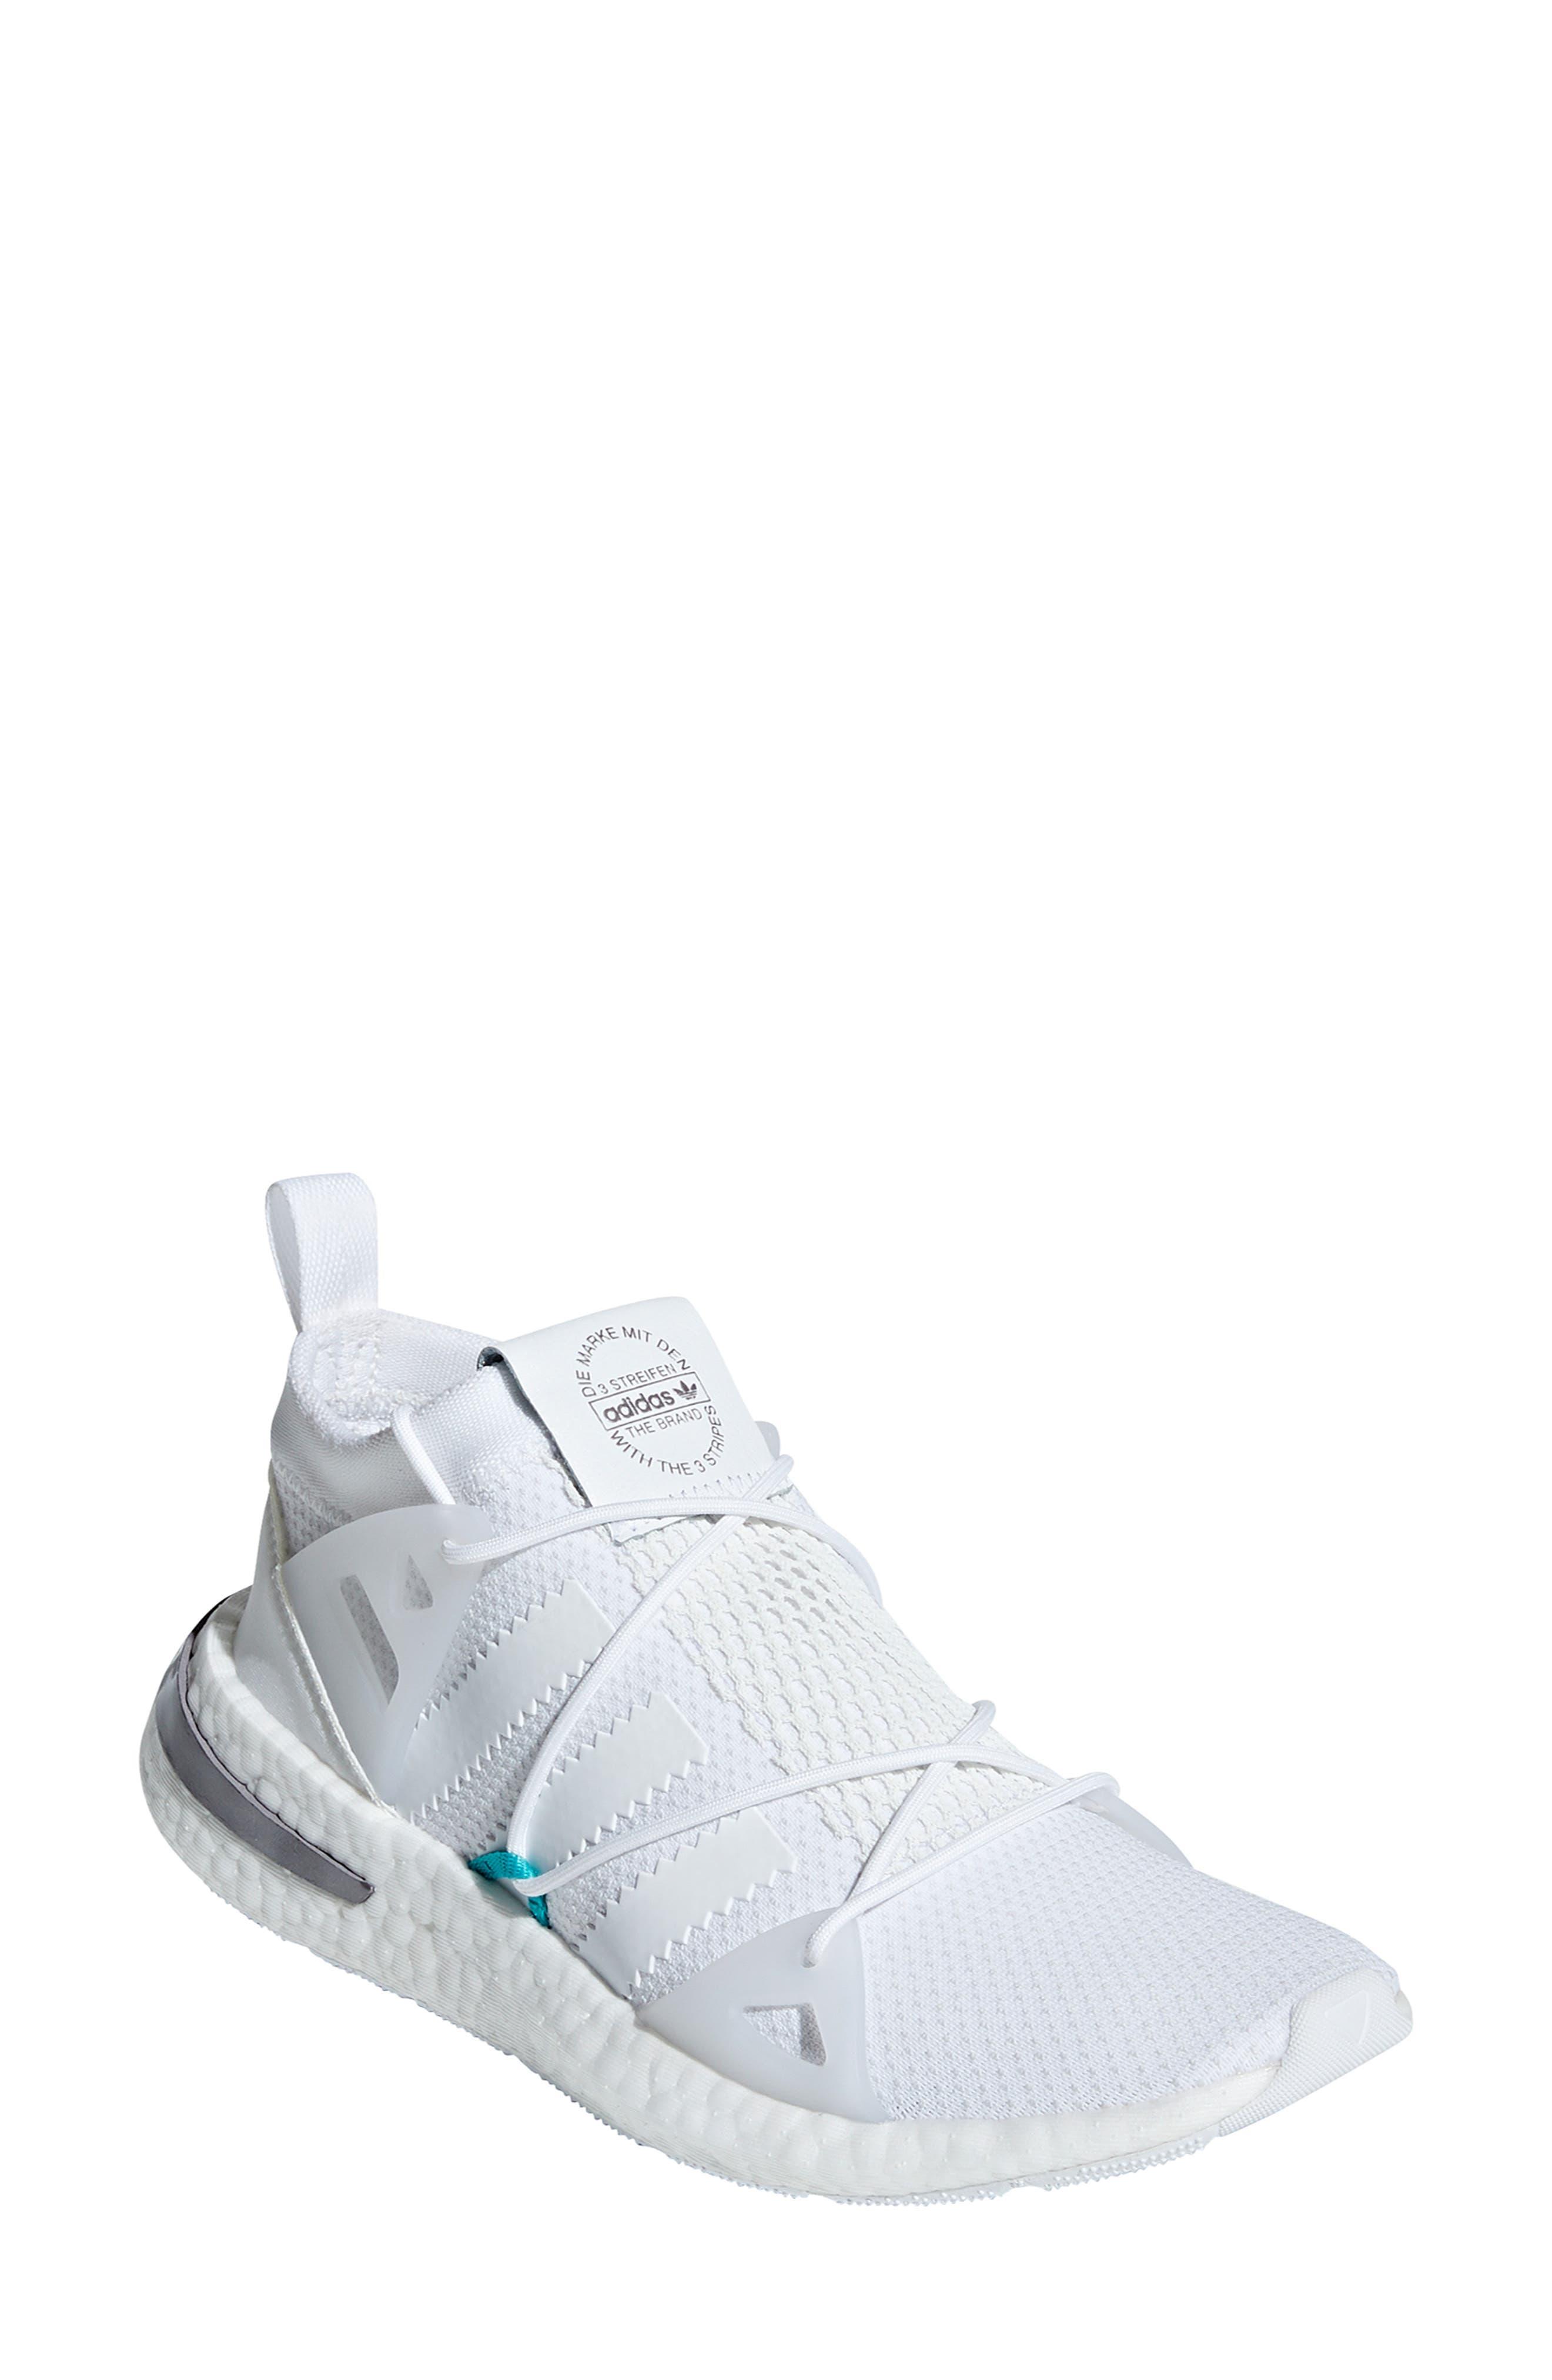 Arkyn Sneaker,                             Main thumbnail 1, color,                             102